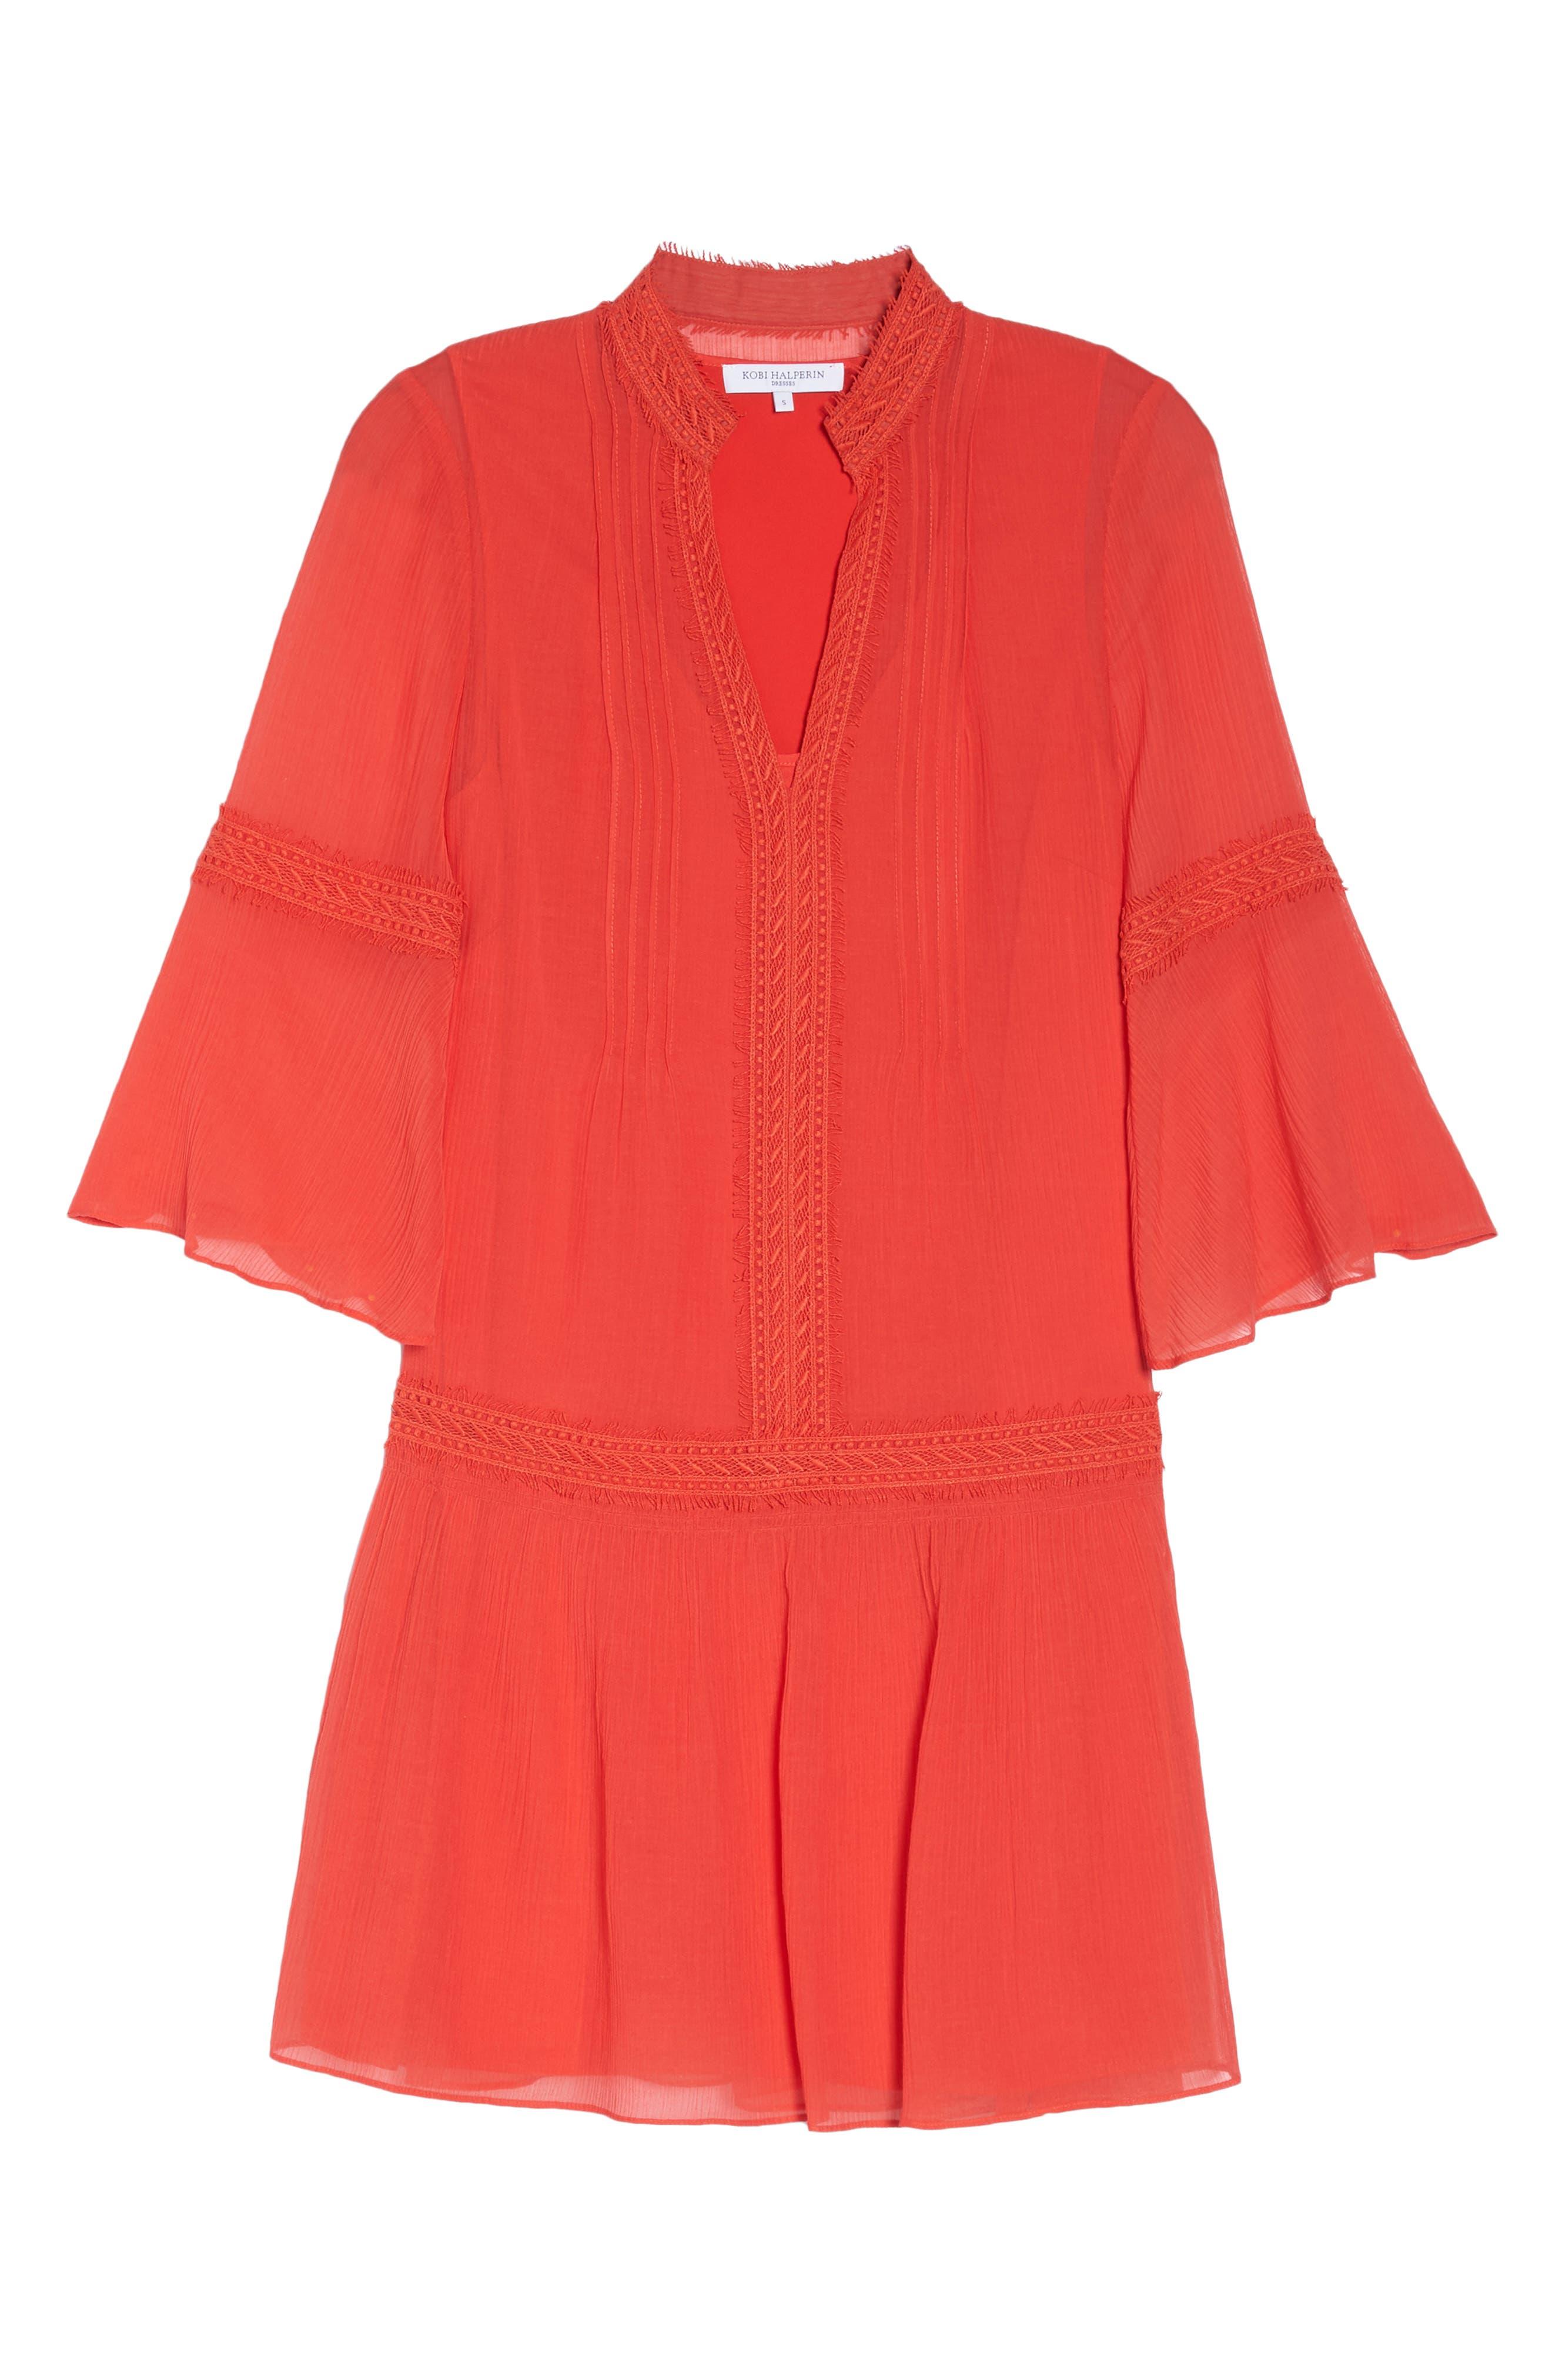 Mala Crinkle Shift Dress,                             Alternate thumbnail 7, color,                             Strawberry